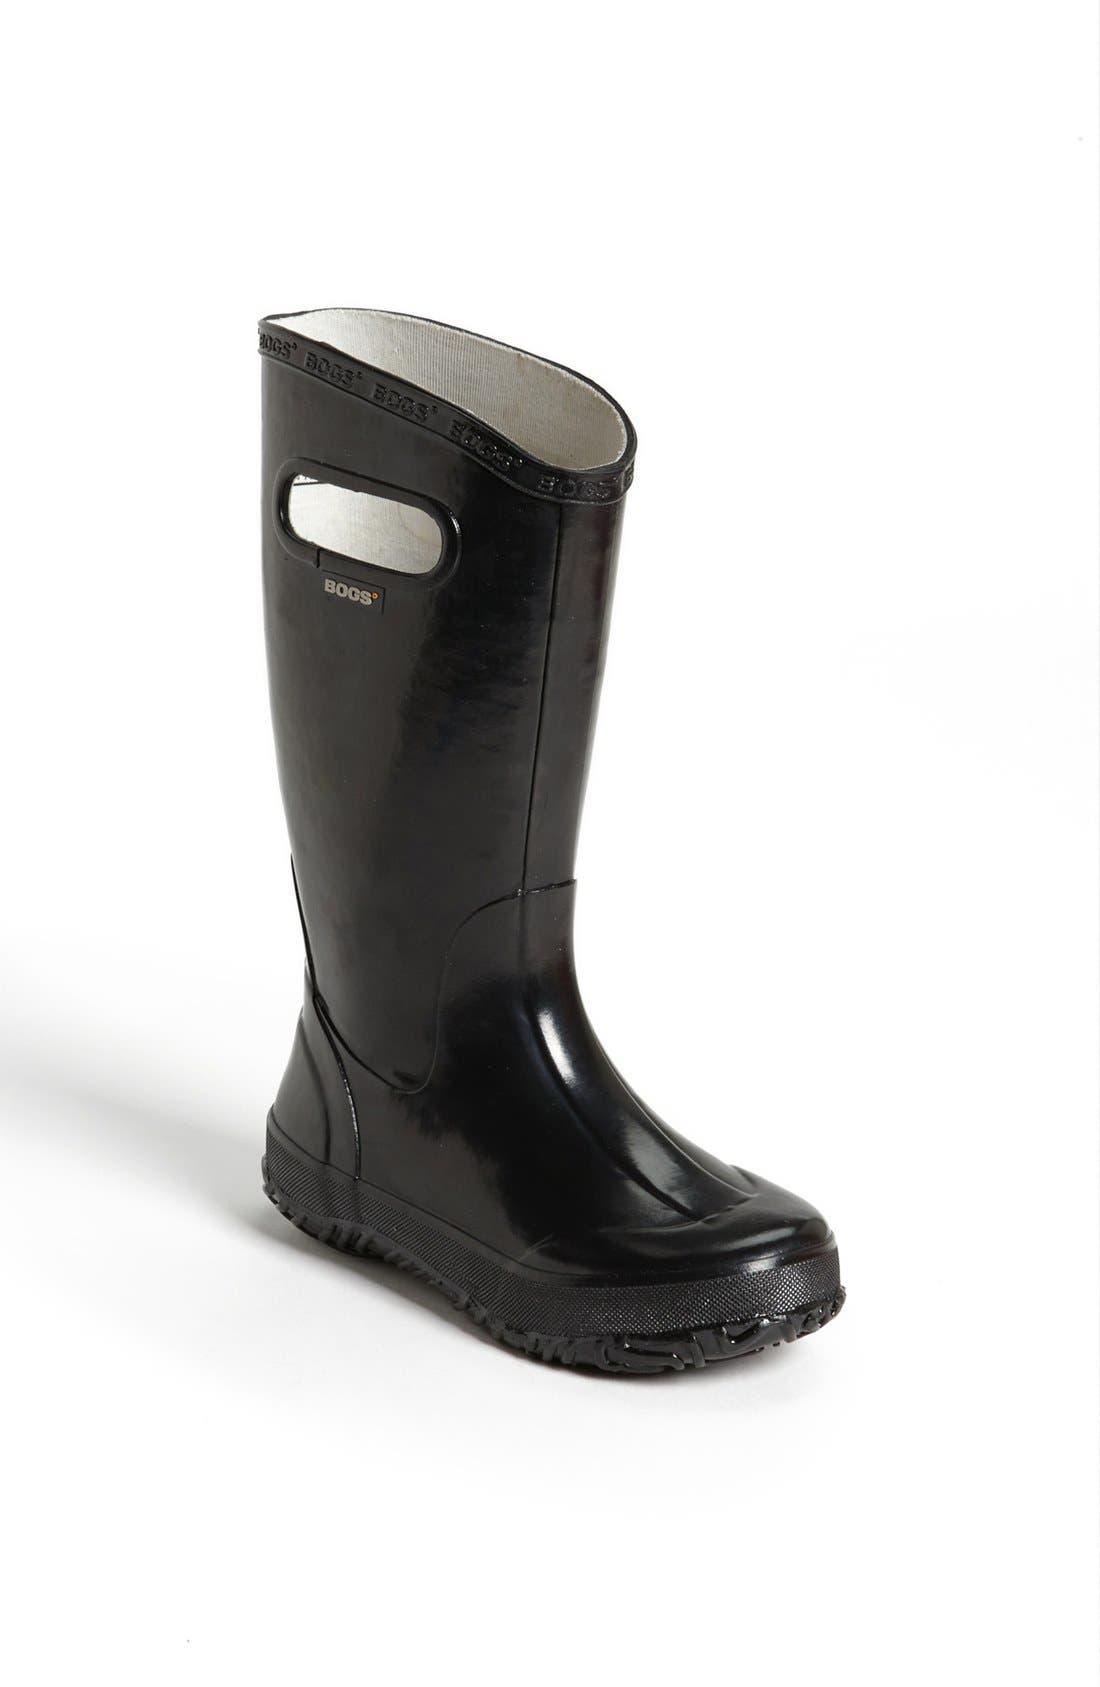 Alternate Image 1 Selected - Bogs Rubber Rain Boot (Walker, Toddler, Little Kid & Big Kid)